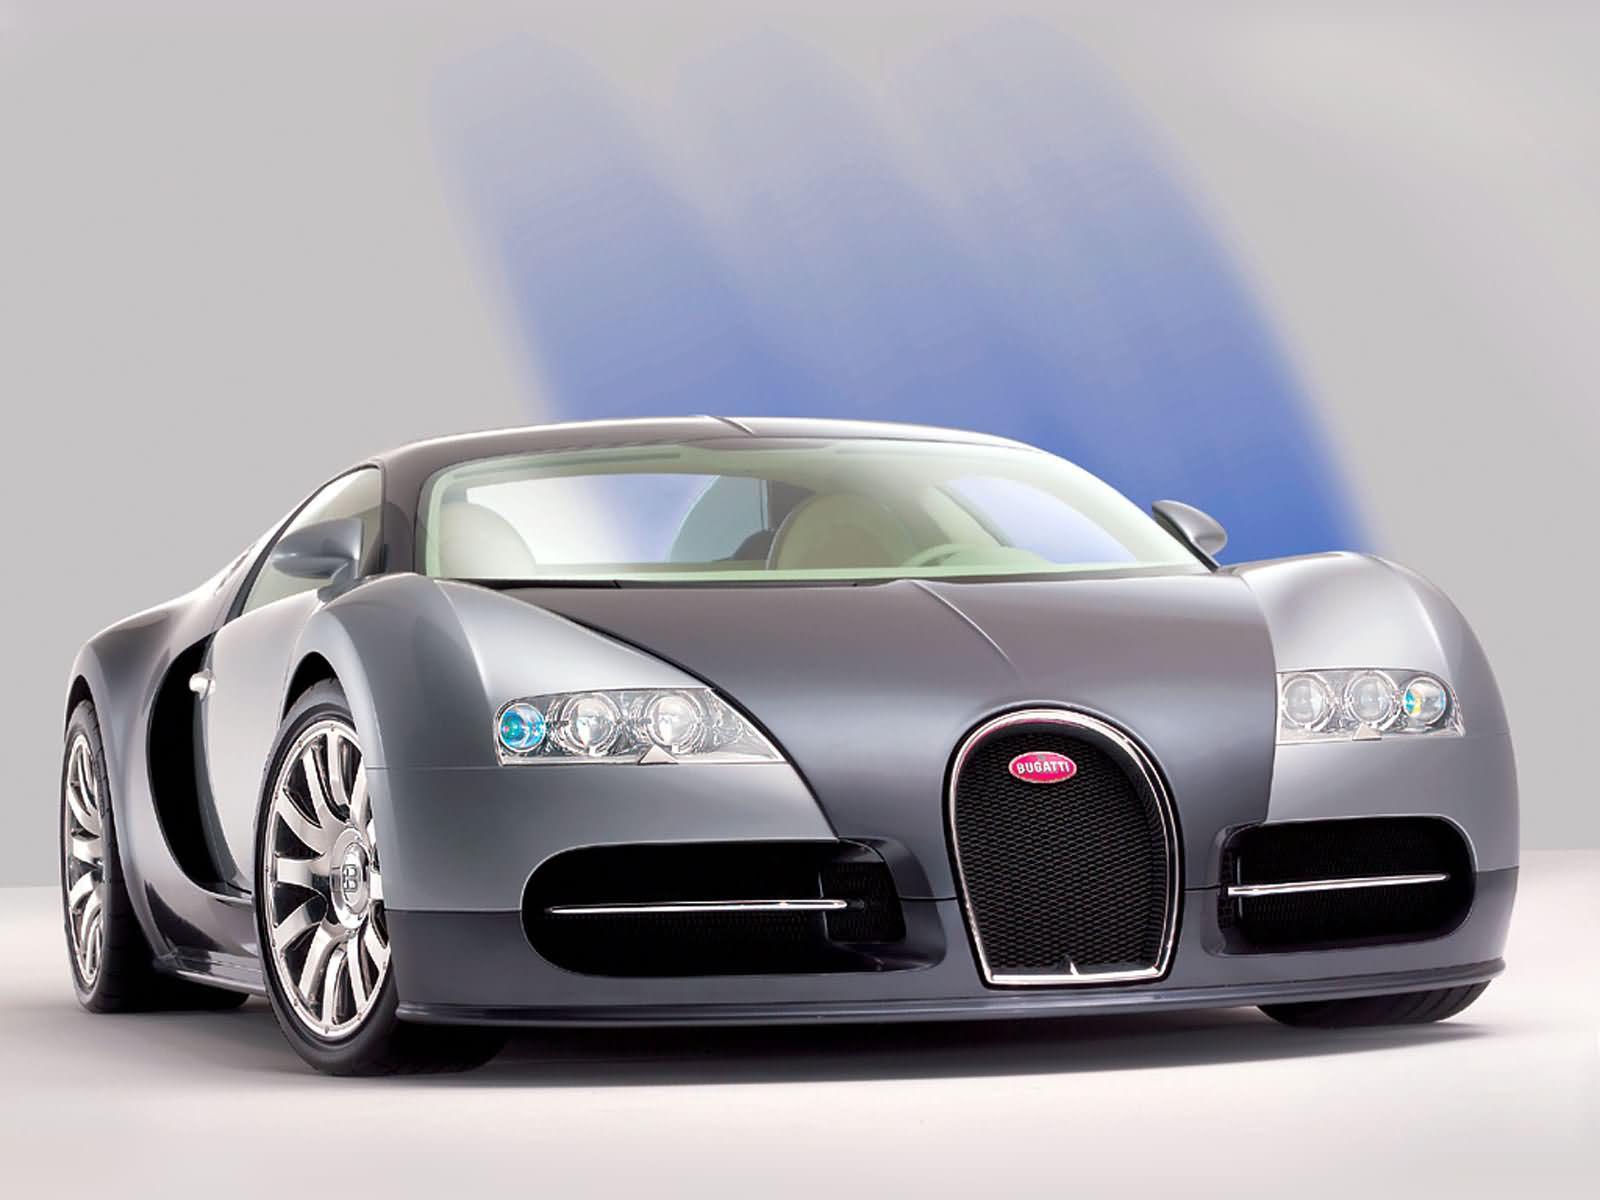 http://3.bp.blogspot.com/-nYBUyCu0nsc/T4CE3zSdwbI/AAAAAAAAATw/MBXlXp_t1mU/s1600/bugatti-veyron-wallpaper%2B6.jpg